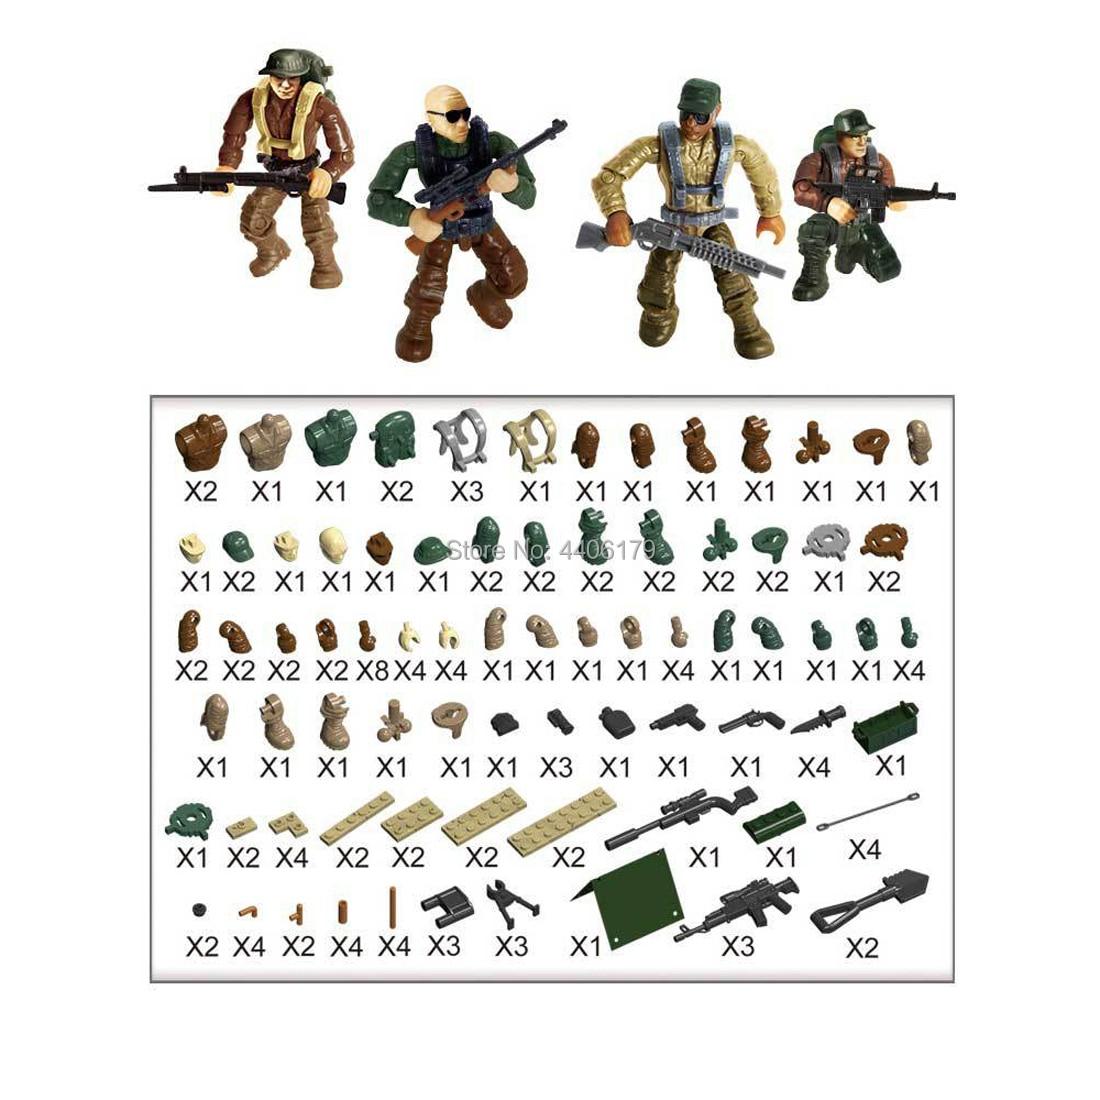 hot LegoINGlys military base war Sirius Commando soldier figures Building Blocks weapons guns model brick toys for children gift